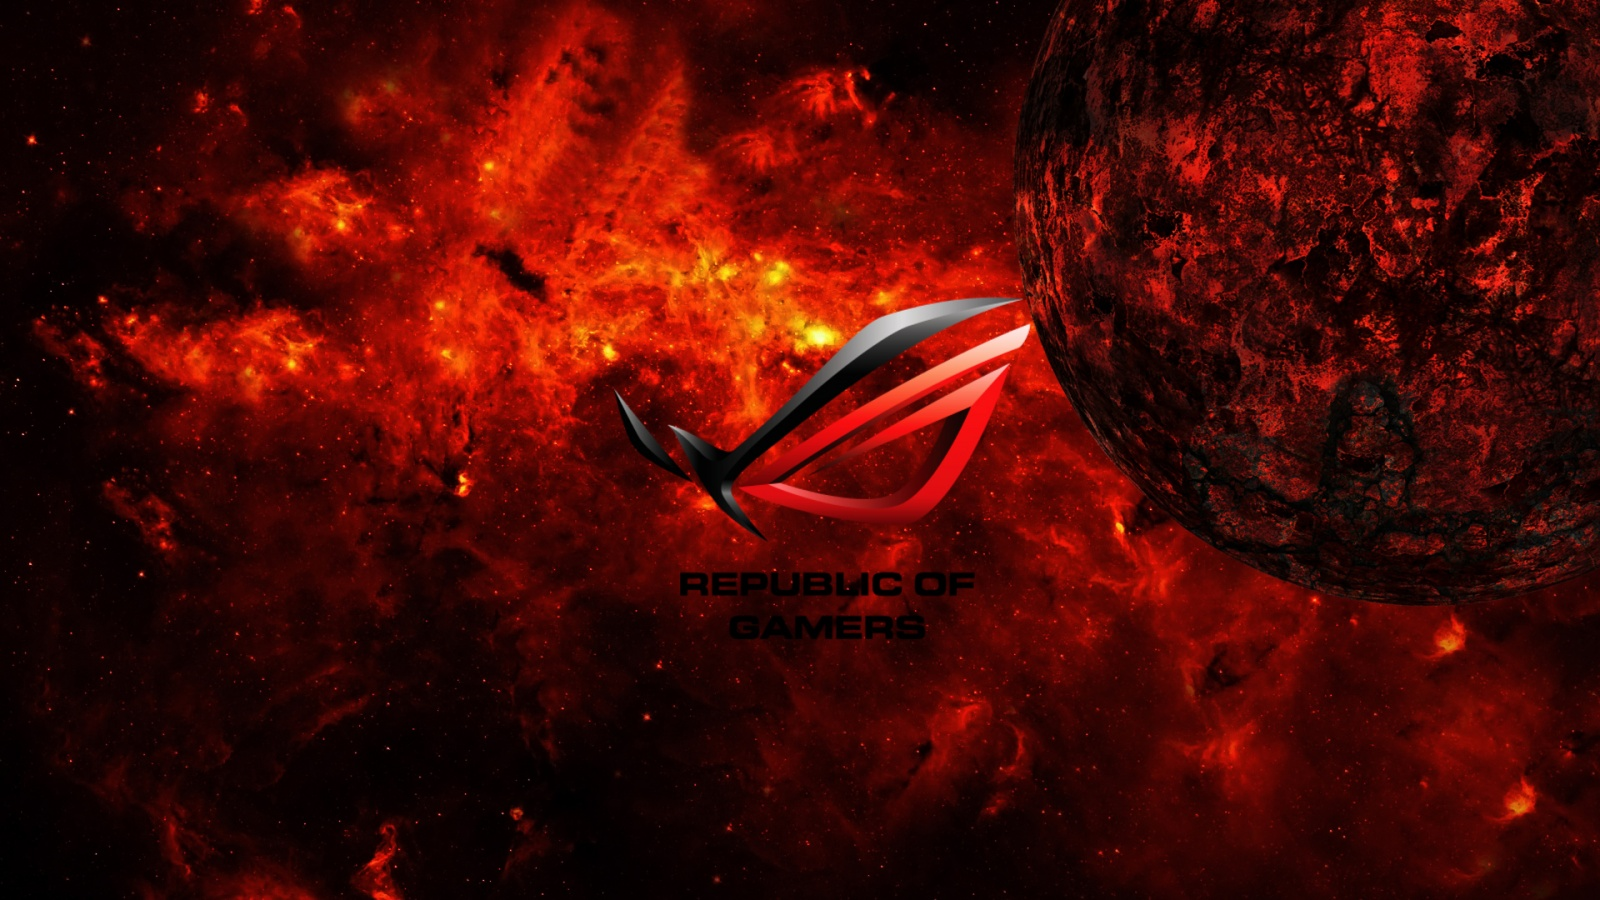 Asus Republic Of Gamers 1600 x 900 Download Close 1600x900